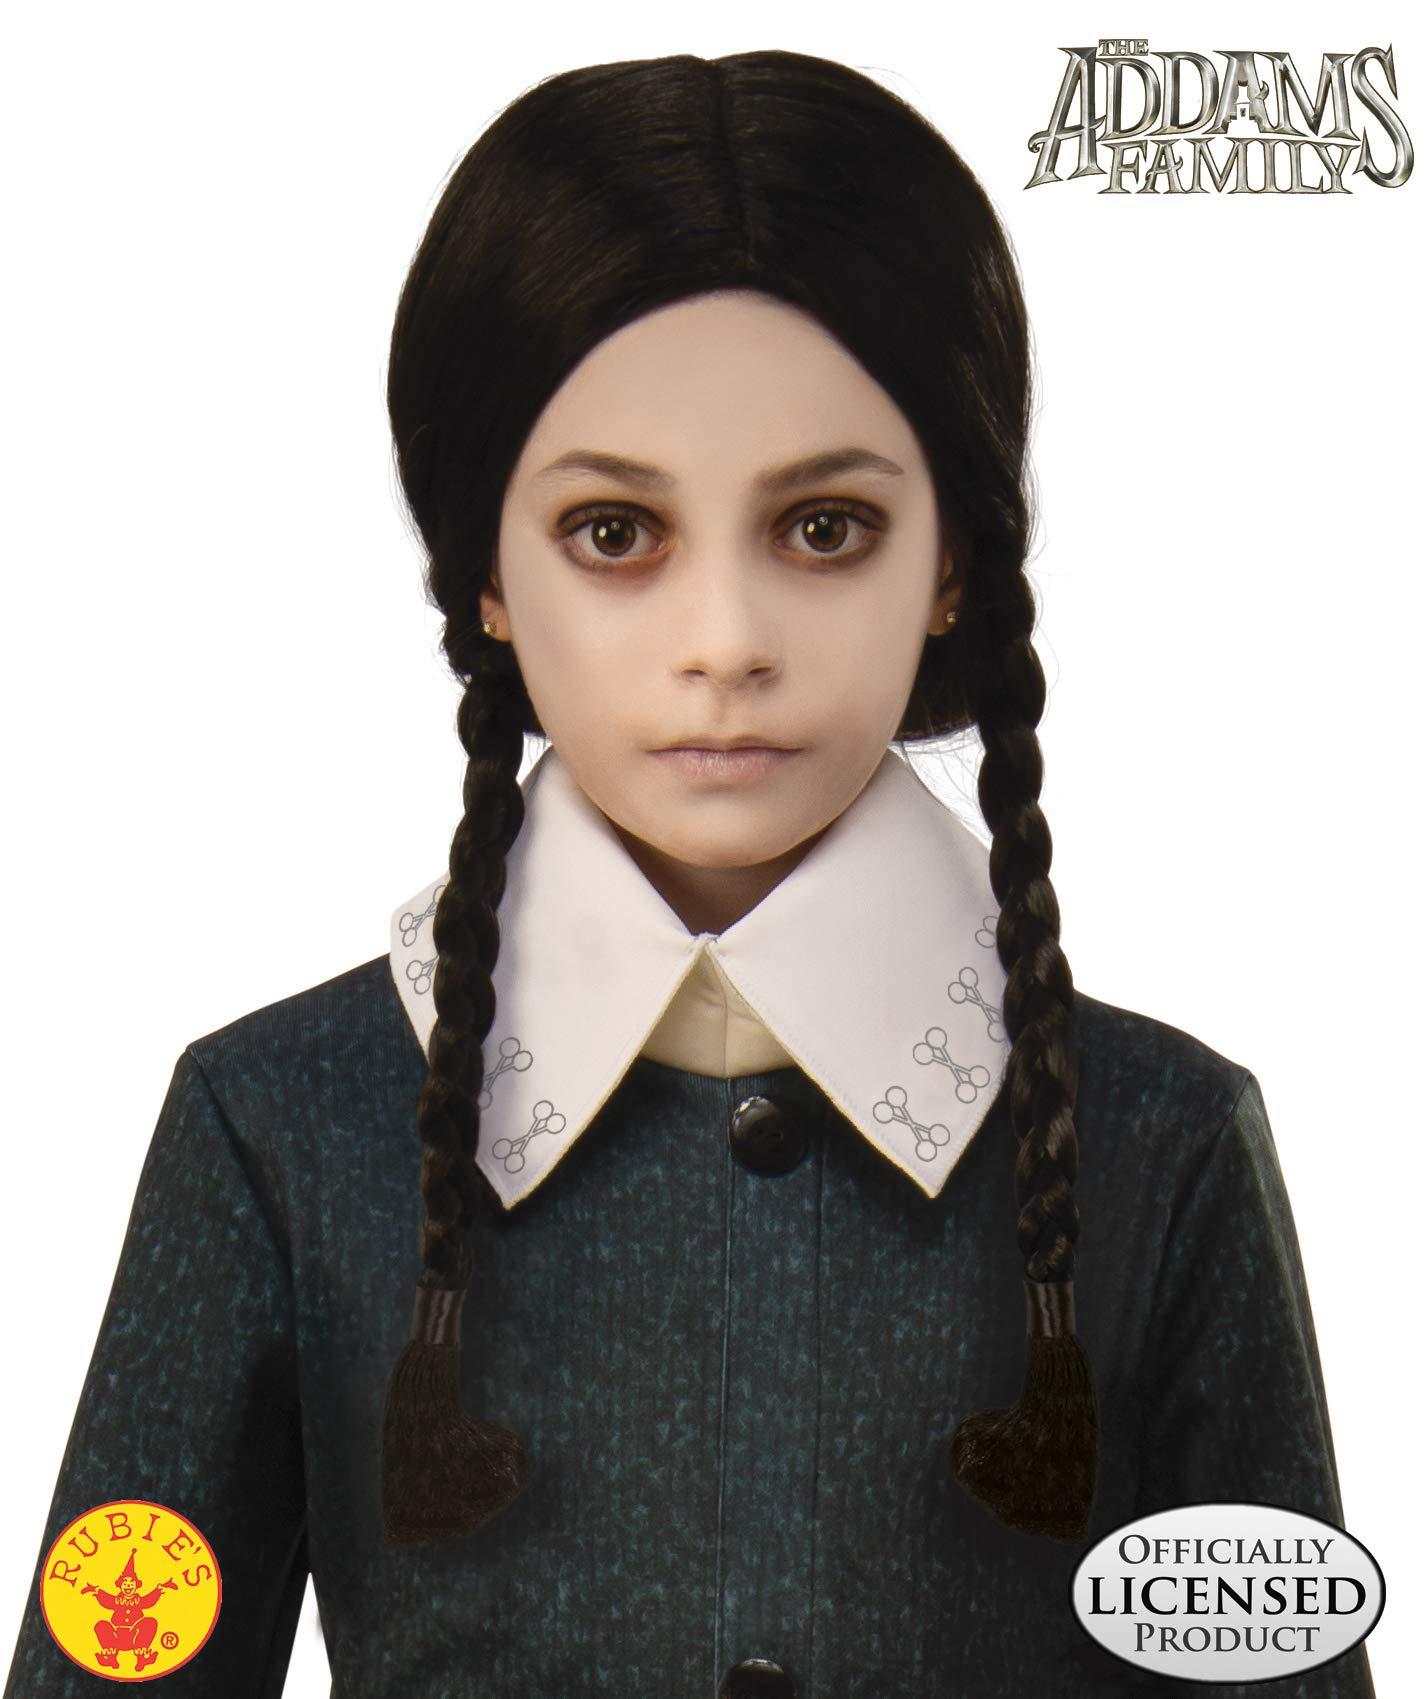 Rubie's Addams Family Animated Movie Child's Wednesday Wig, One Size by Rubie's